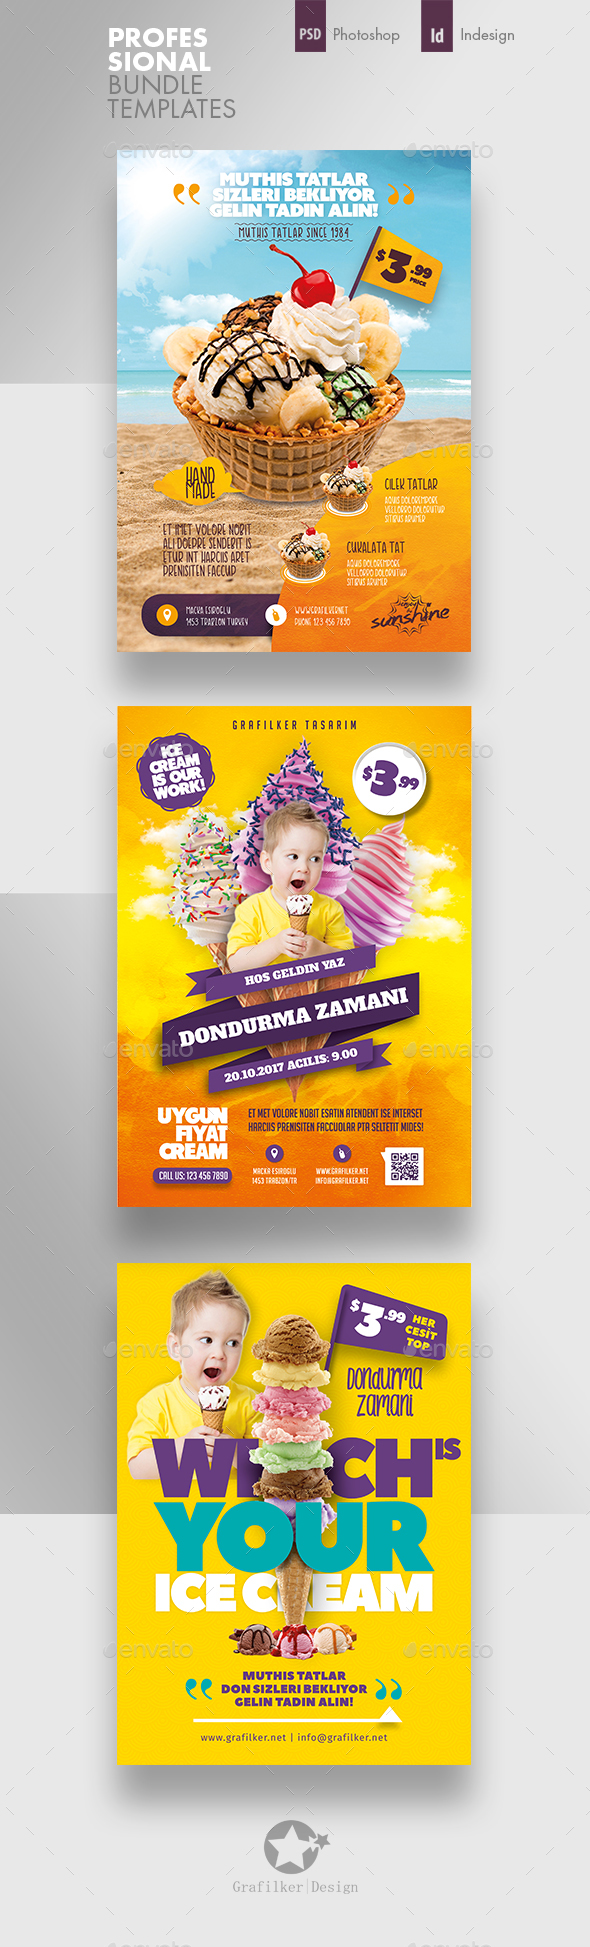 Ice Cream Flyer Bundle Templates - Corporate Flyers